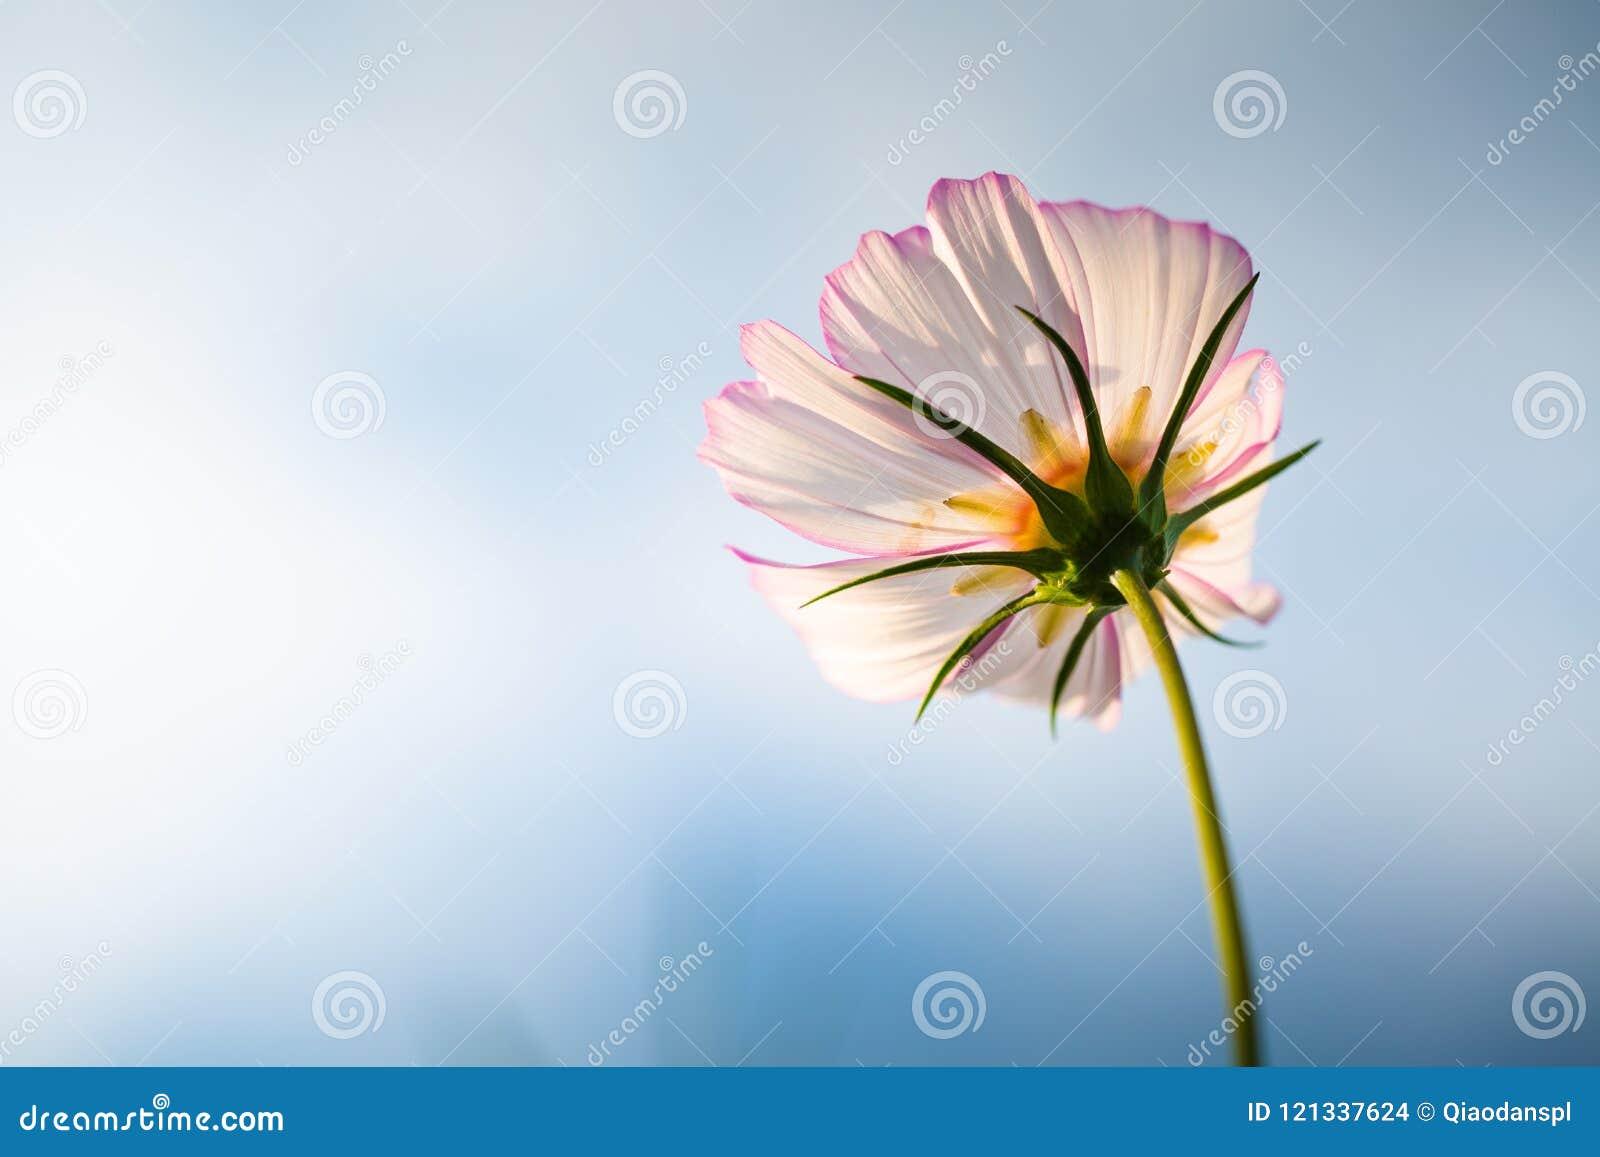 Cosmos bipinnata cav flower stock photo image of leaves green cosmos bipinnata cav flower izmirmasajfo